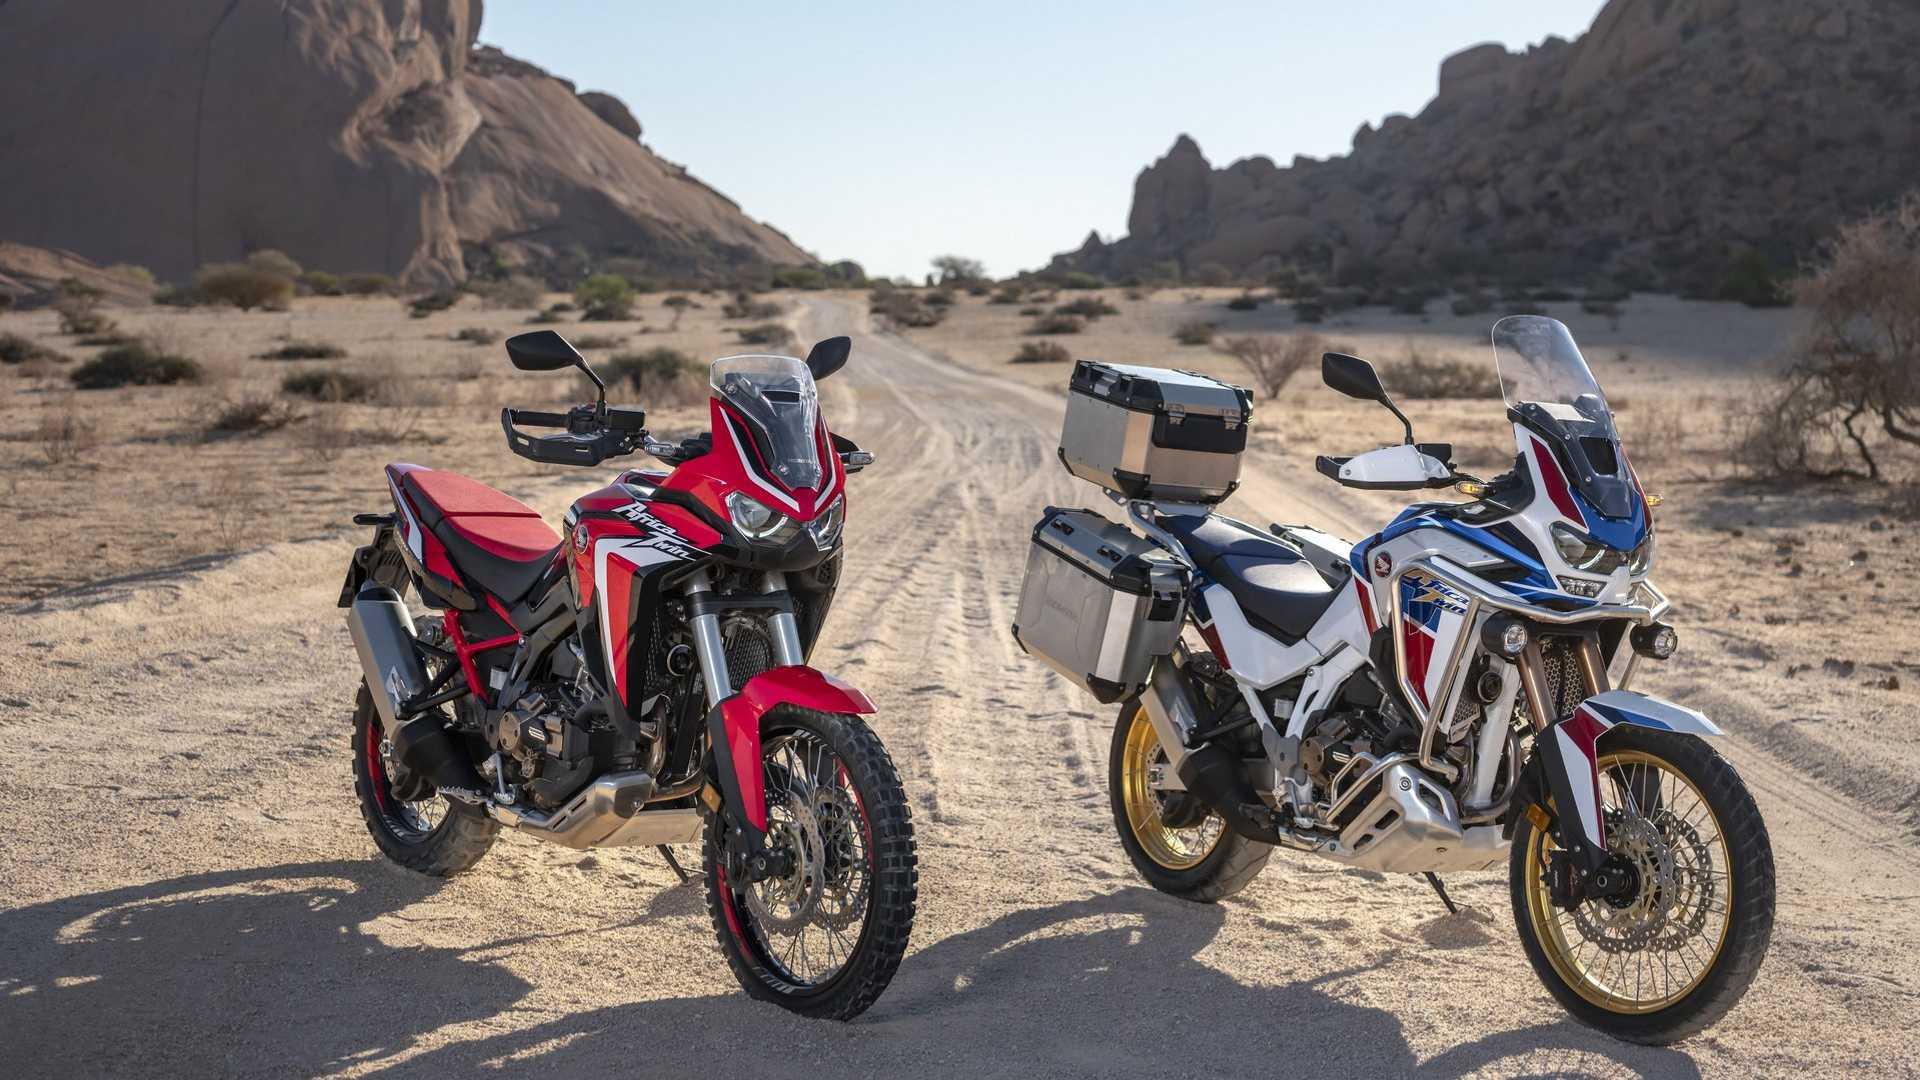 Honda(ホンダ)CRF1100L Africa Twin(アフリカツイン)正式公開!